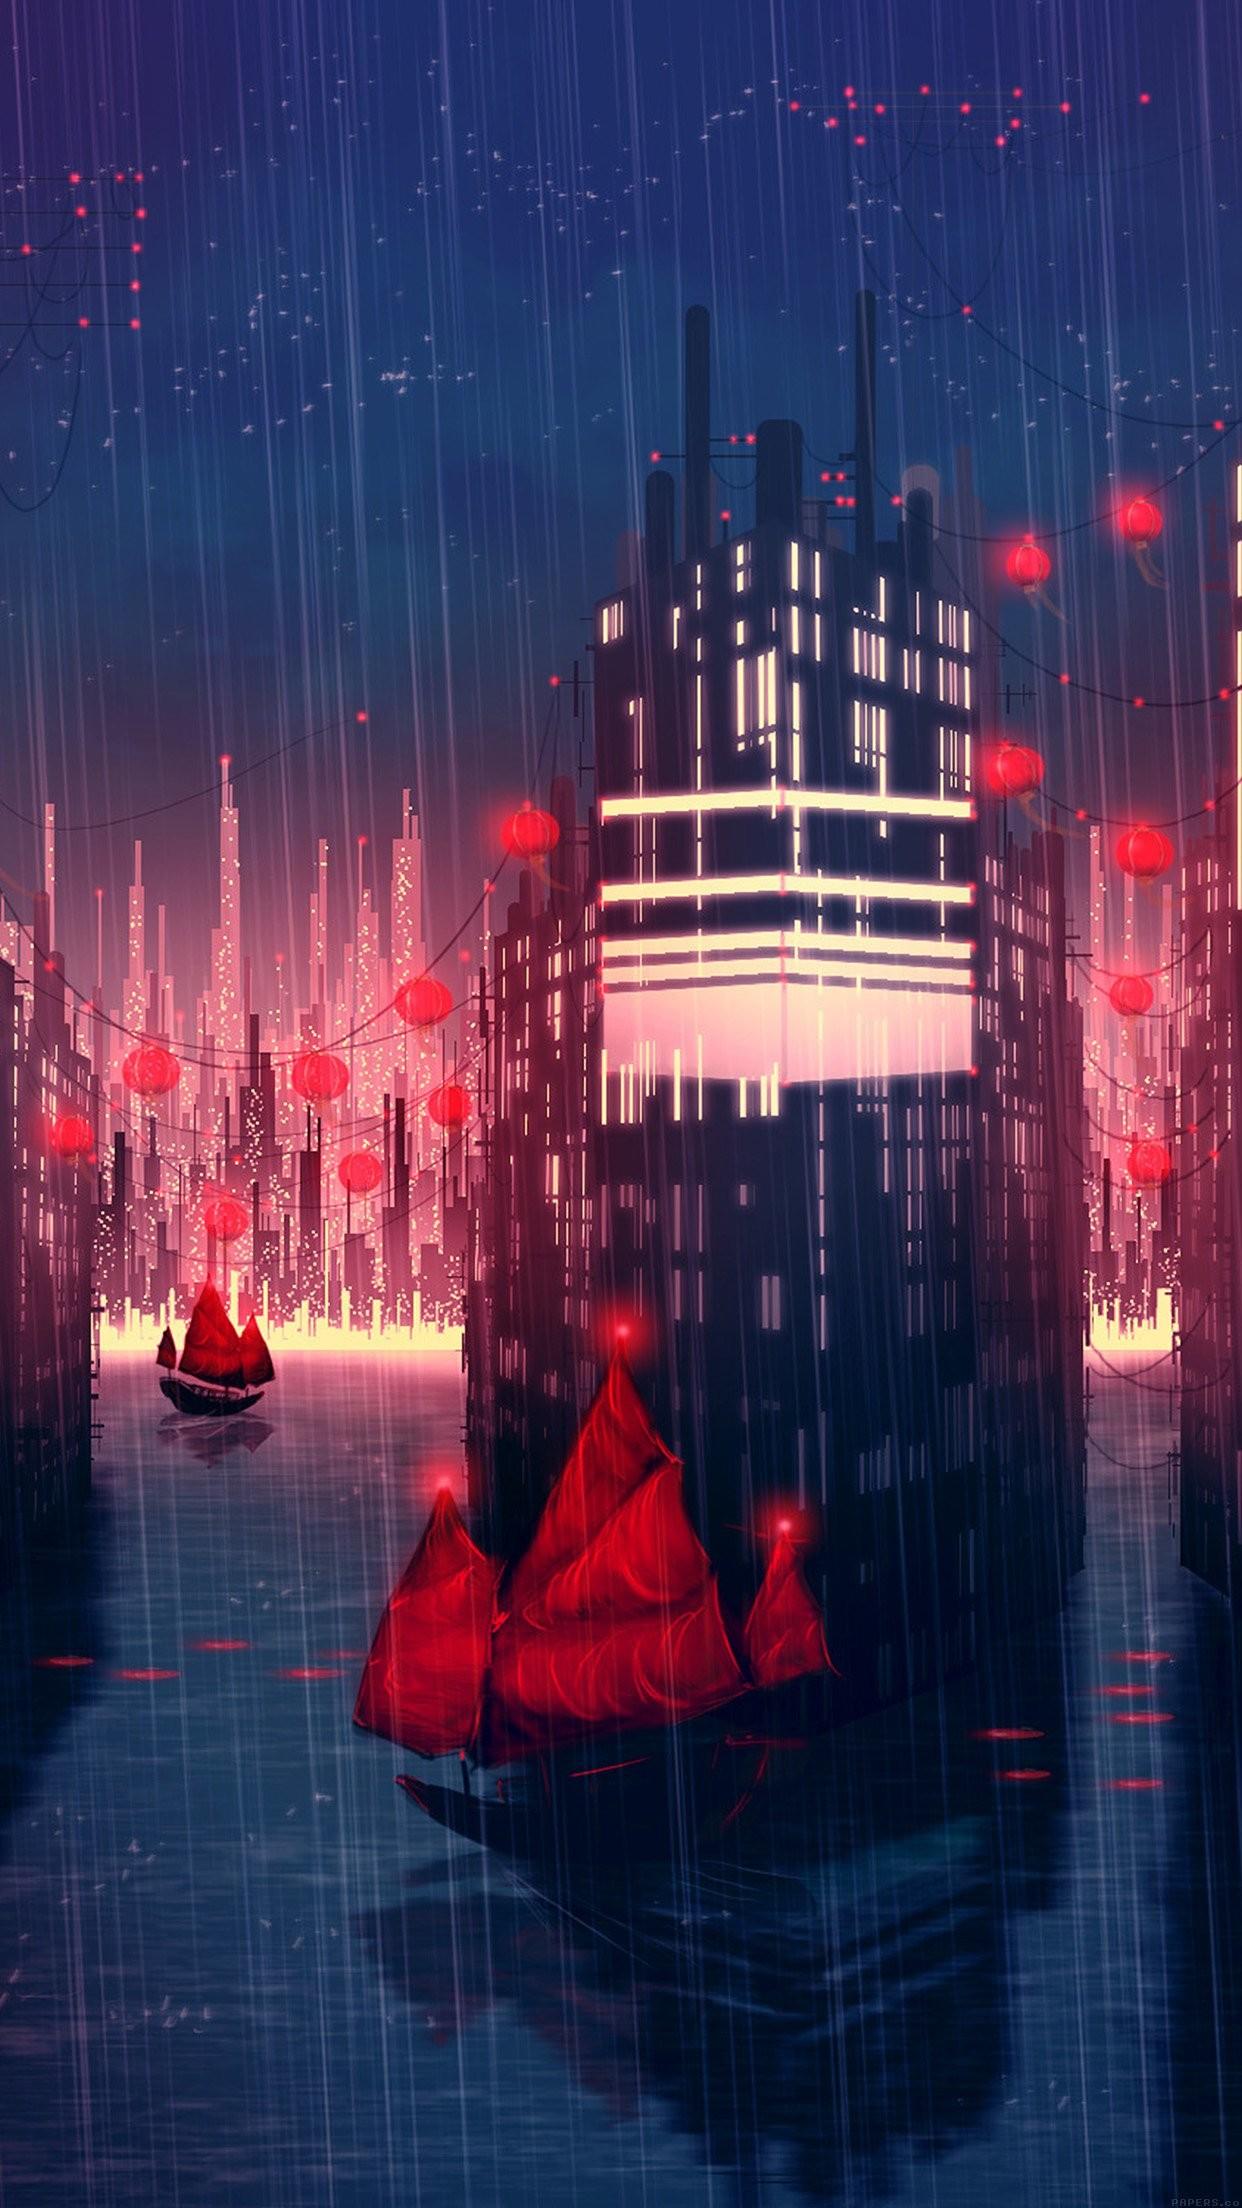 Purple Rain Iphone Wallpaper 61 Images